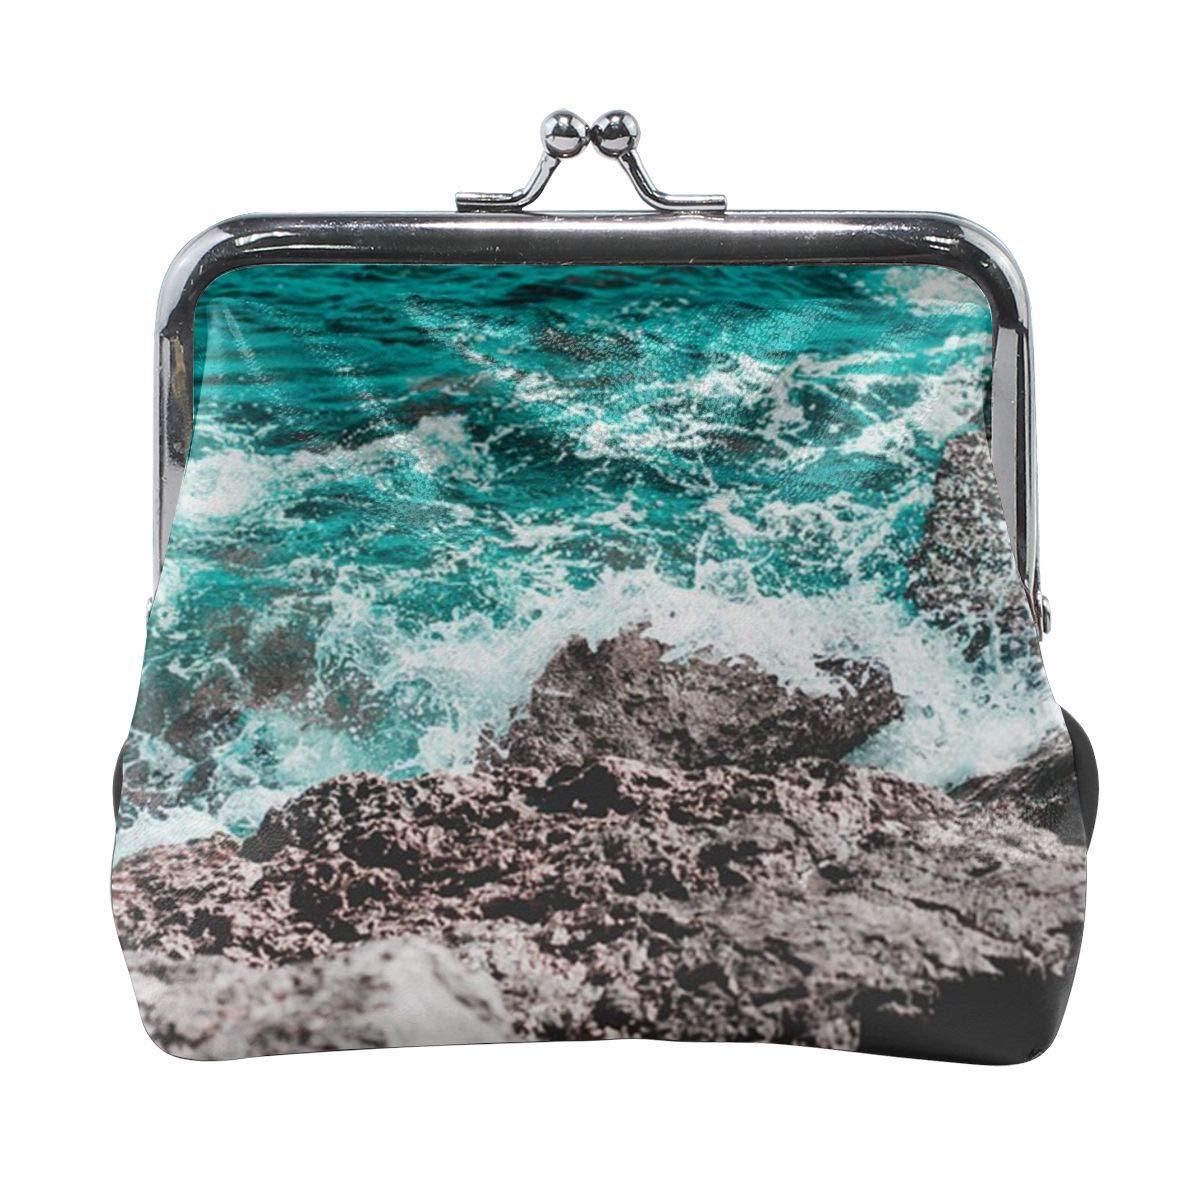 TYDhey Sea Water Splash On The Rocks Classic Buckle Coin Purses Leather Kiss-Lock Change Wallets